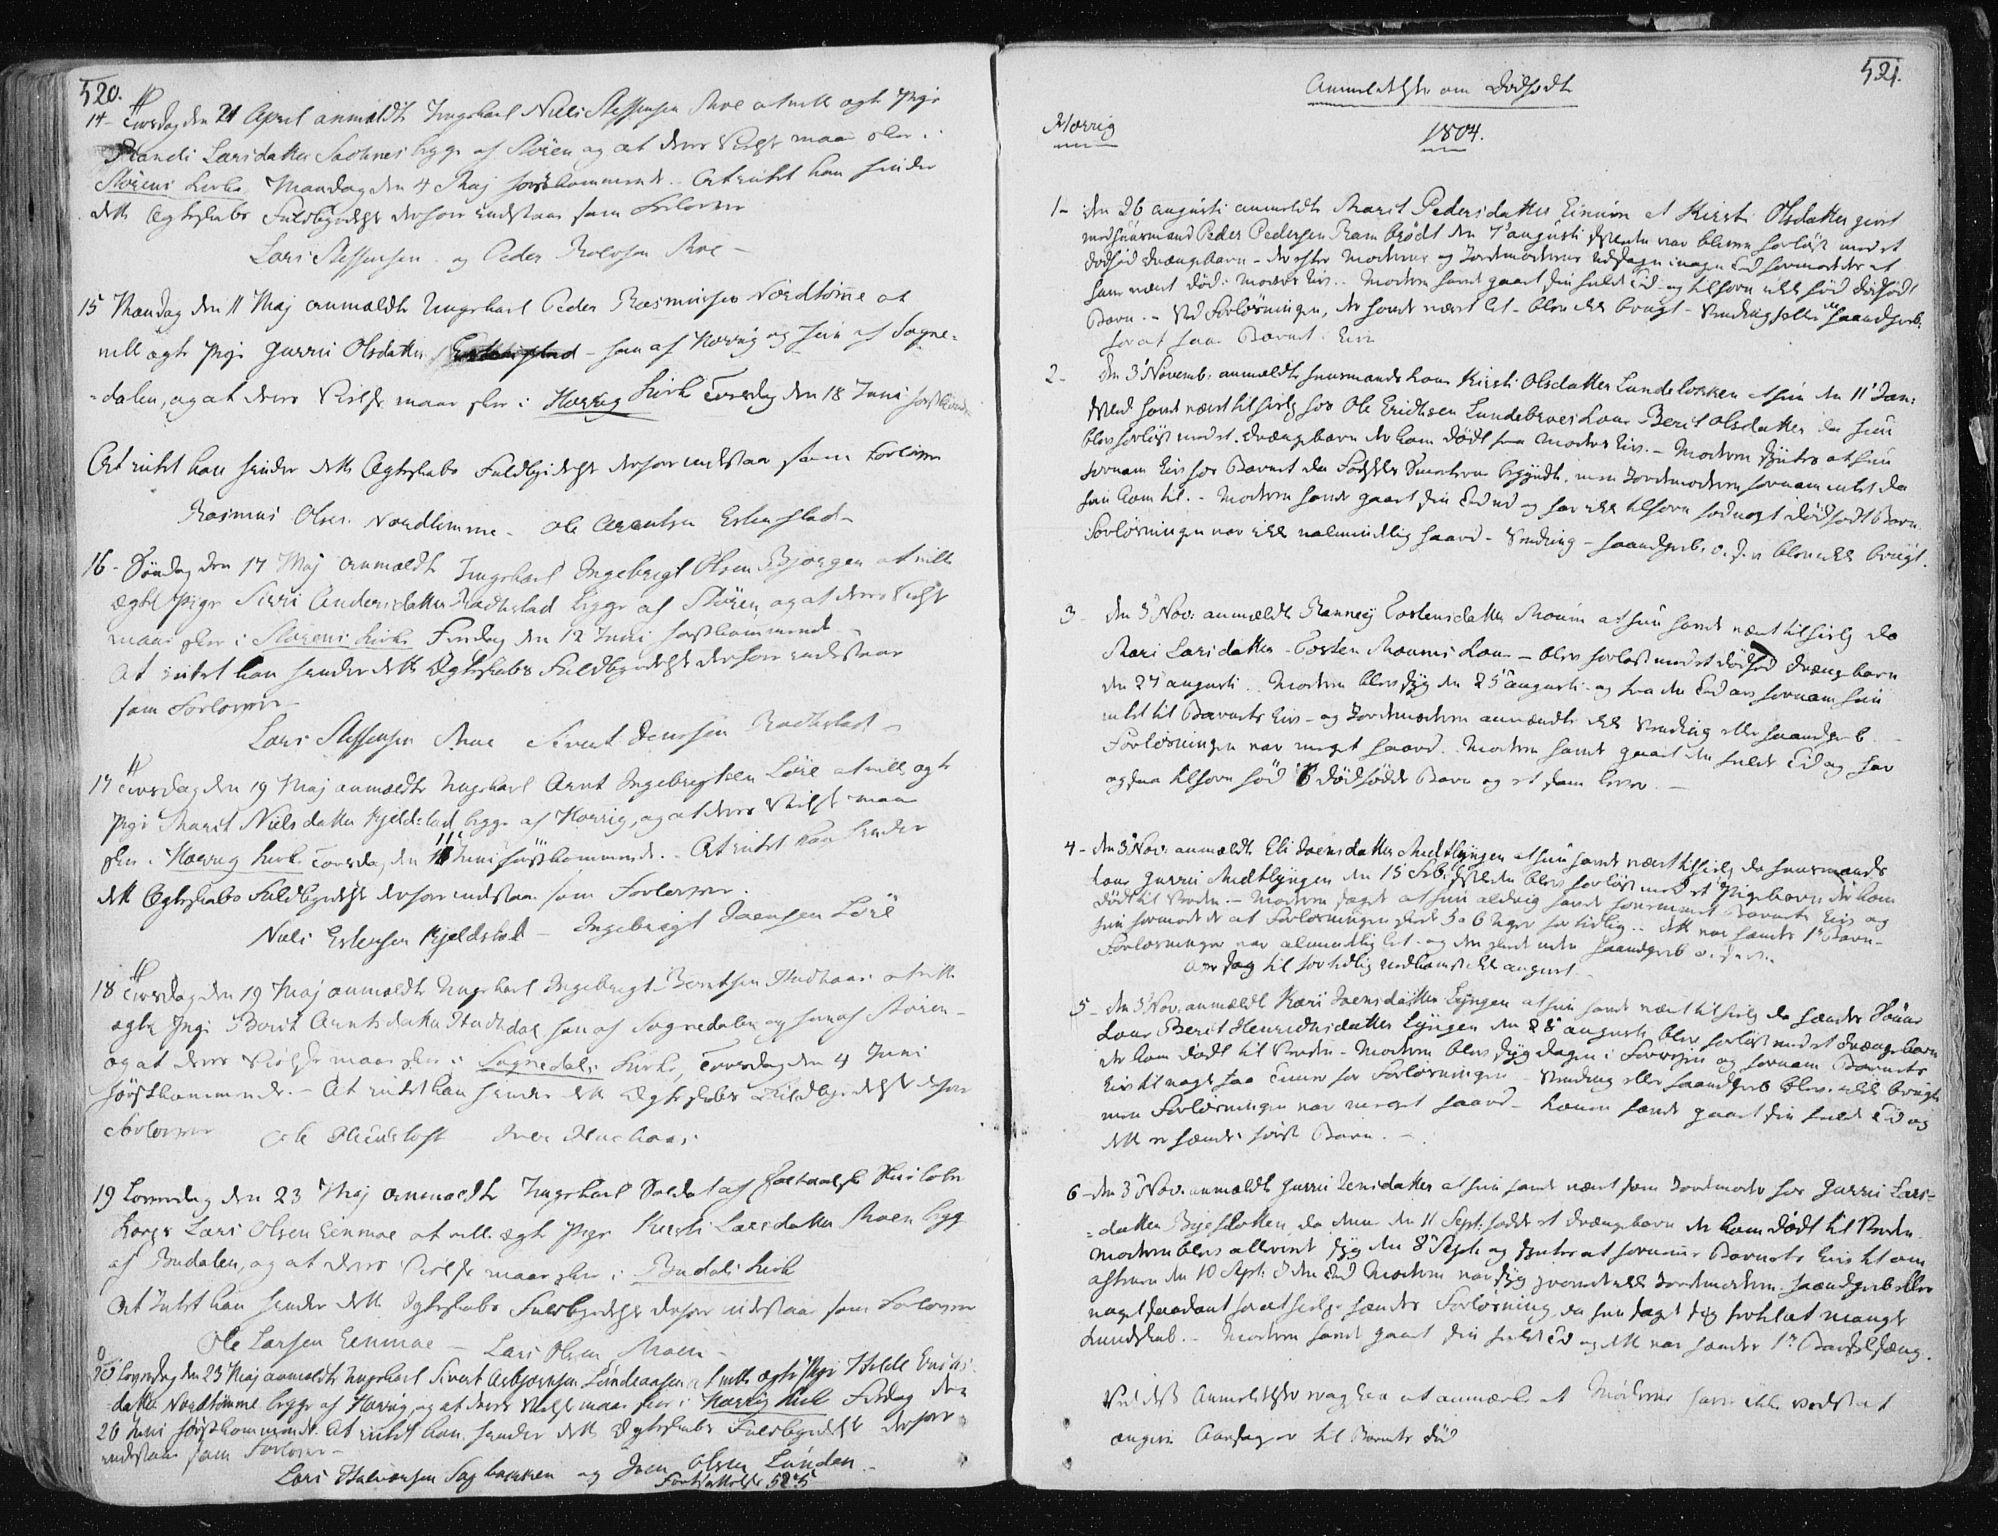 SAT, Ministerialprotokoller, klokkerbøker og fødselsregistre - Sør-Trøndelag, 687/L0992: Parish register (official) no. 687A03 /1, 1788-1815, p. 520-521